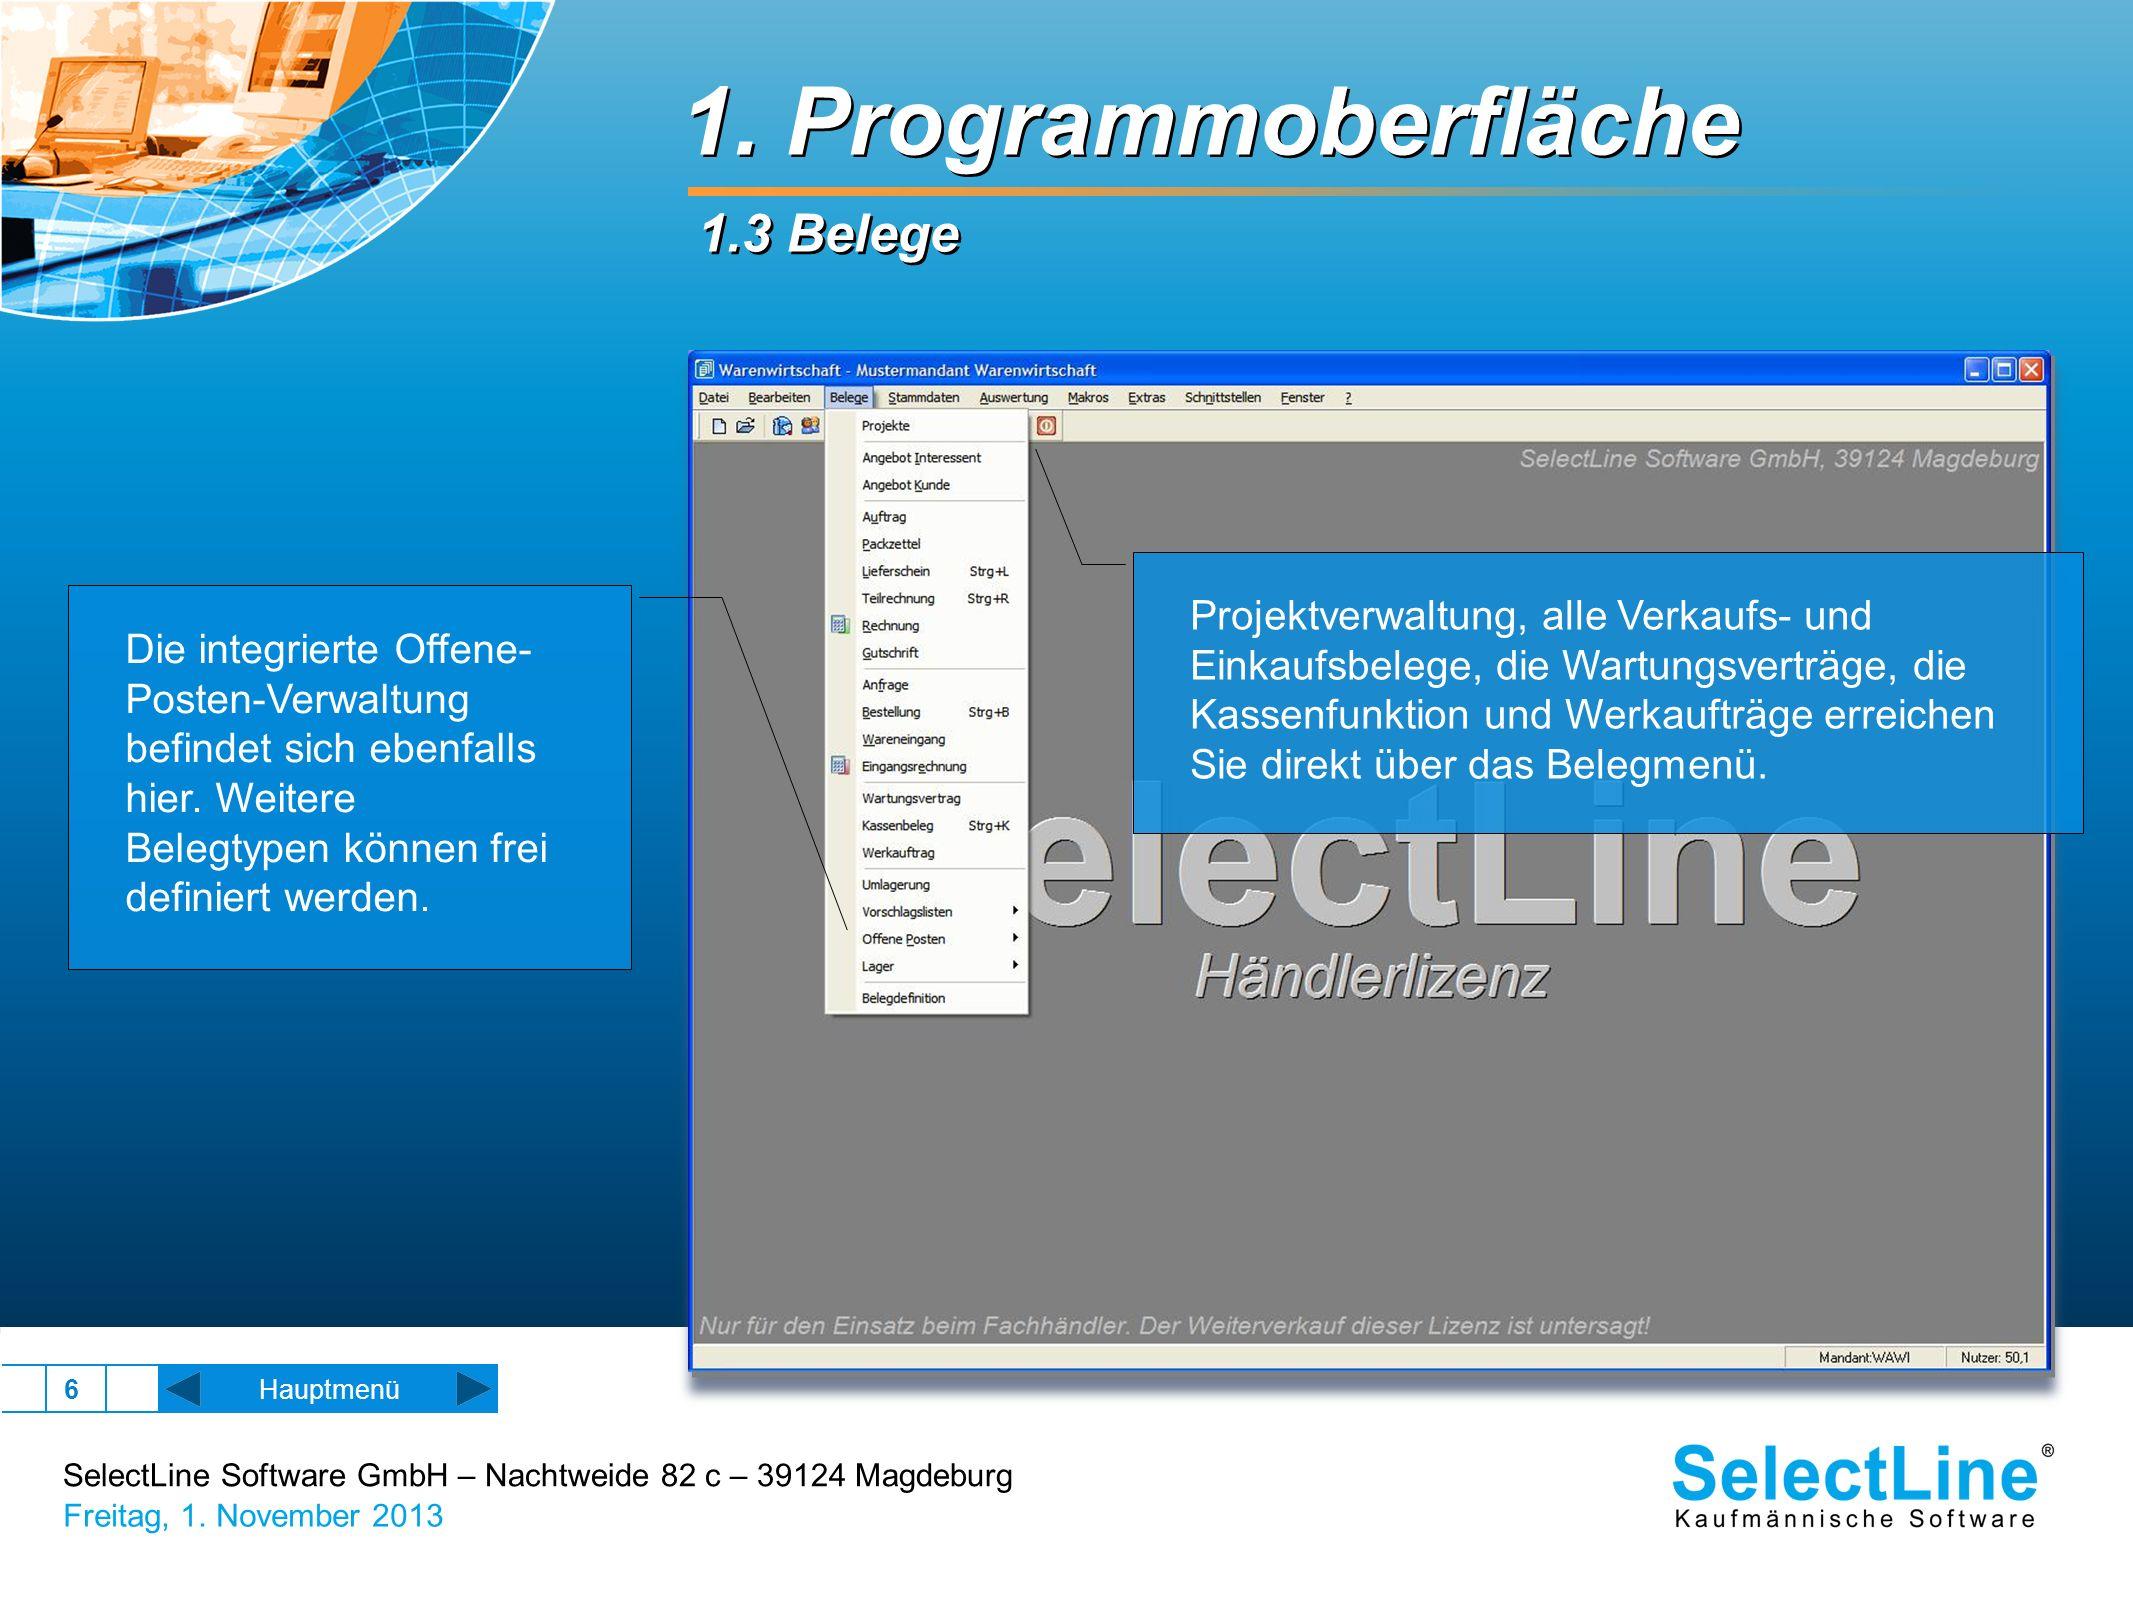 SelectLine Software GmbH – Nachtweide 82 c – 39124 Magdeburg Freitag, 1. November 2013 6 1. Programmoberfläche 1.3 Belege Projektverwaltung, alle Verk